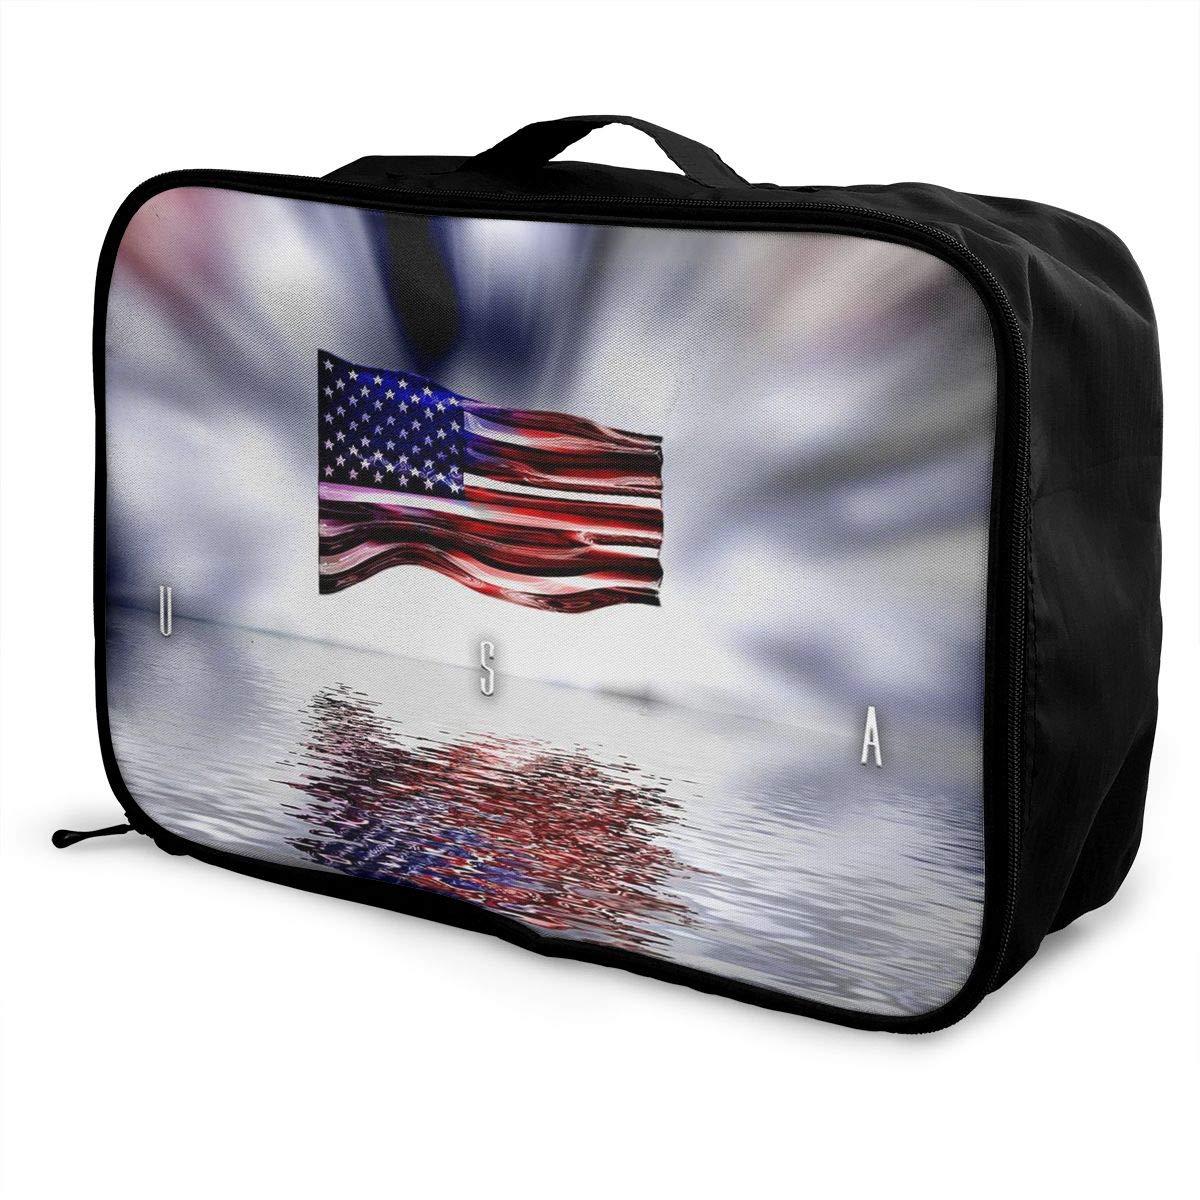 Travel Luggage Duffle Bag Lightweight Portable Handbag USA Flag Large Capacity Waterproof Foldable Storage Tote